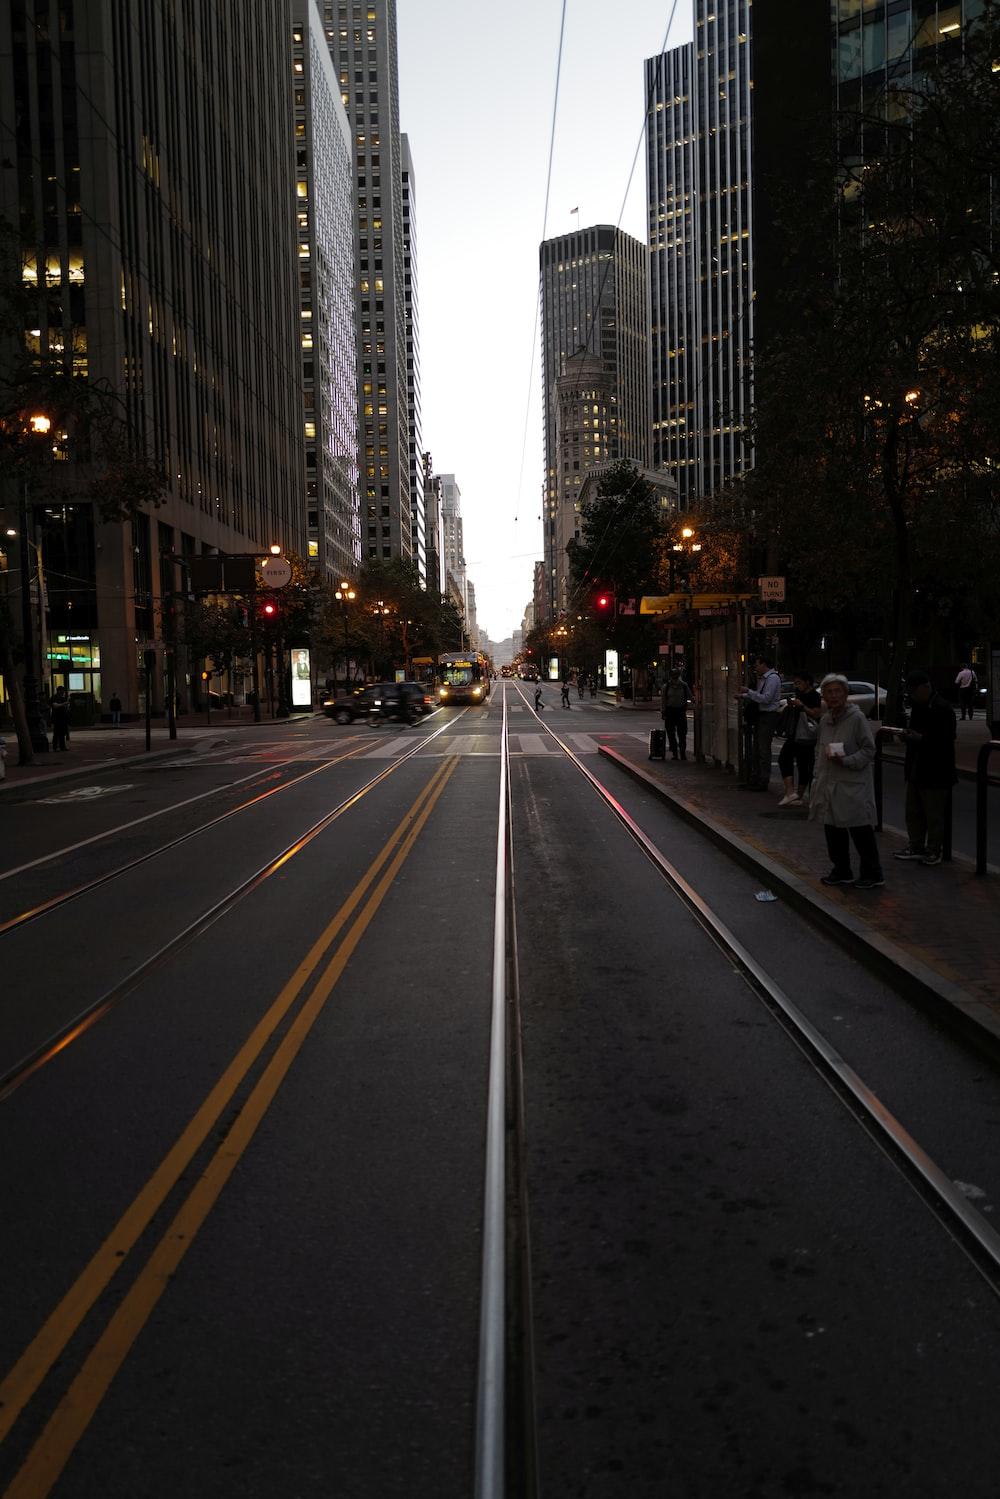 photo of asphalt road scenery